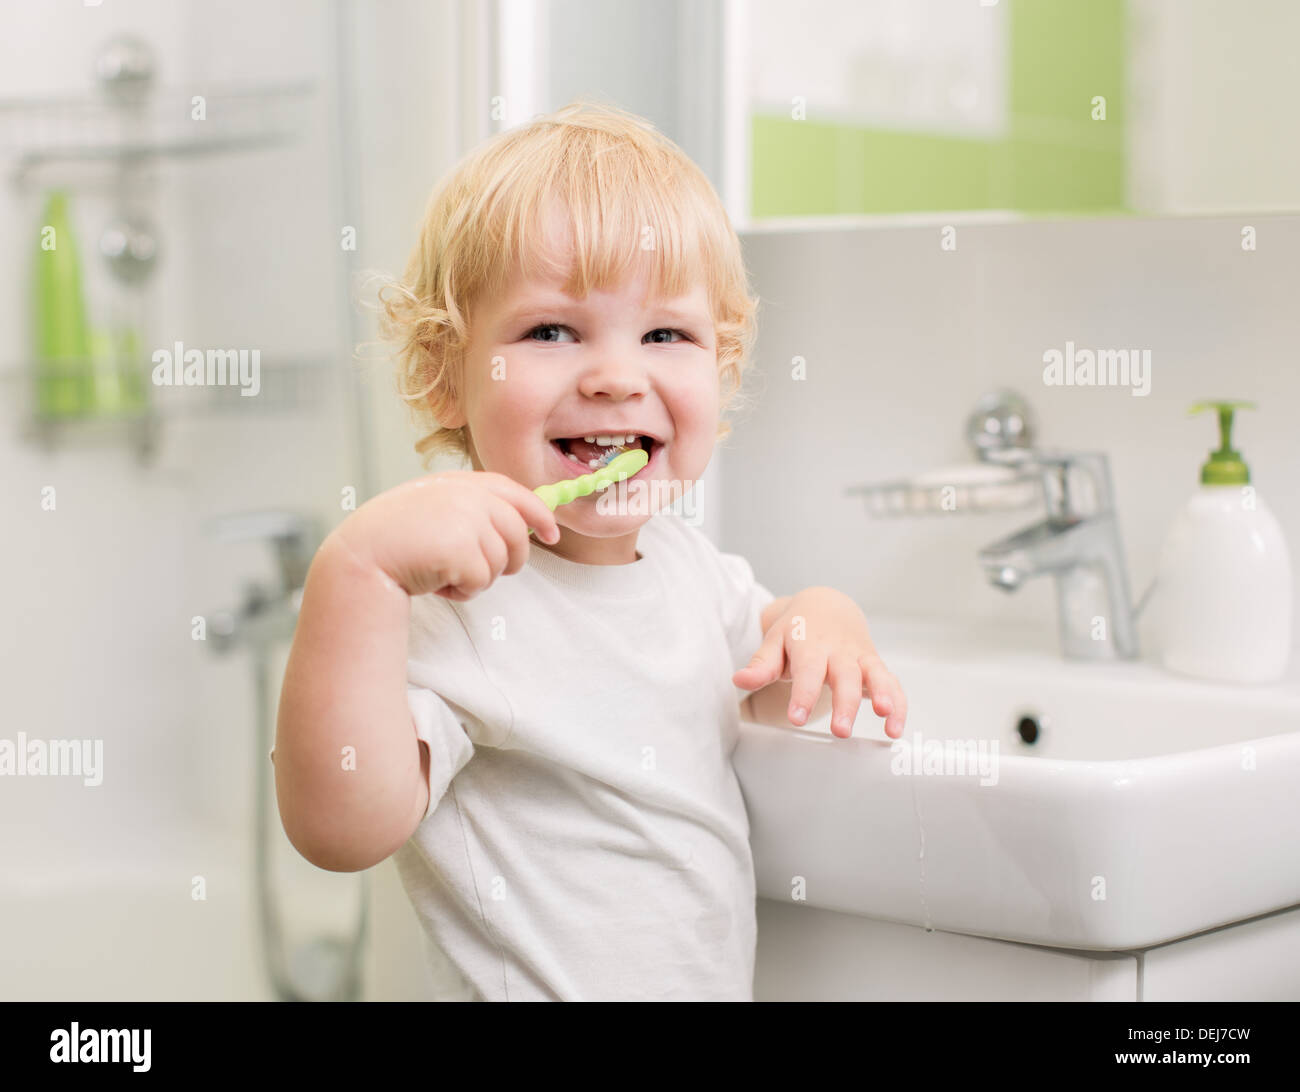 Happy kid brushing teeth - Stock Image